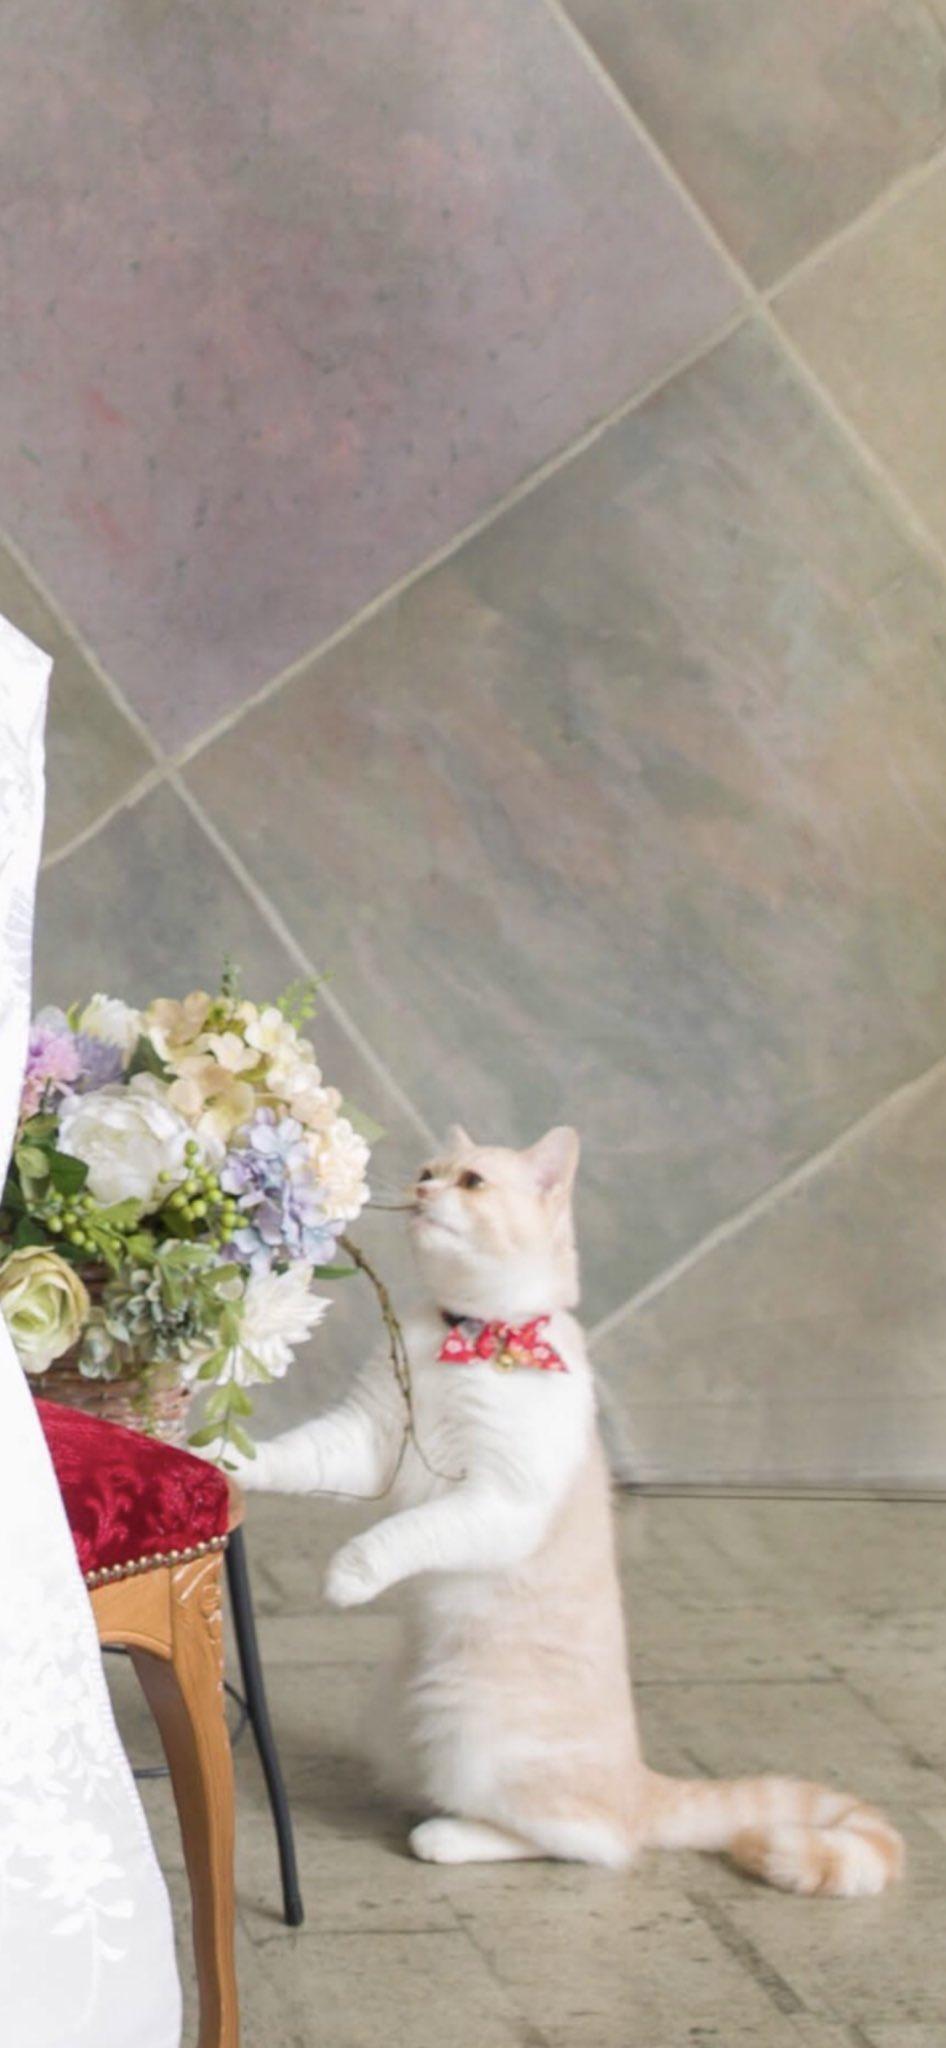 結婚記念写真と猫02